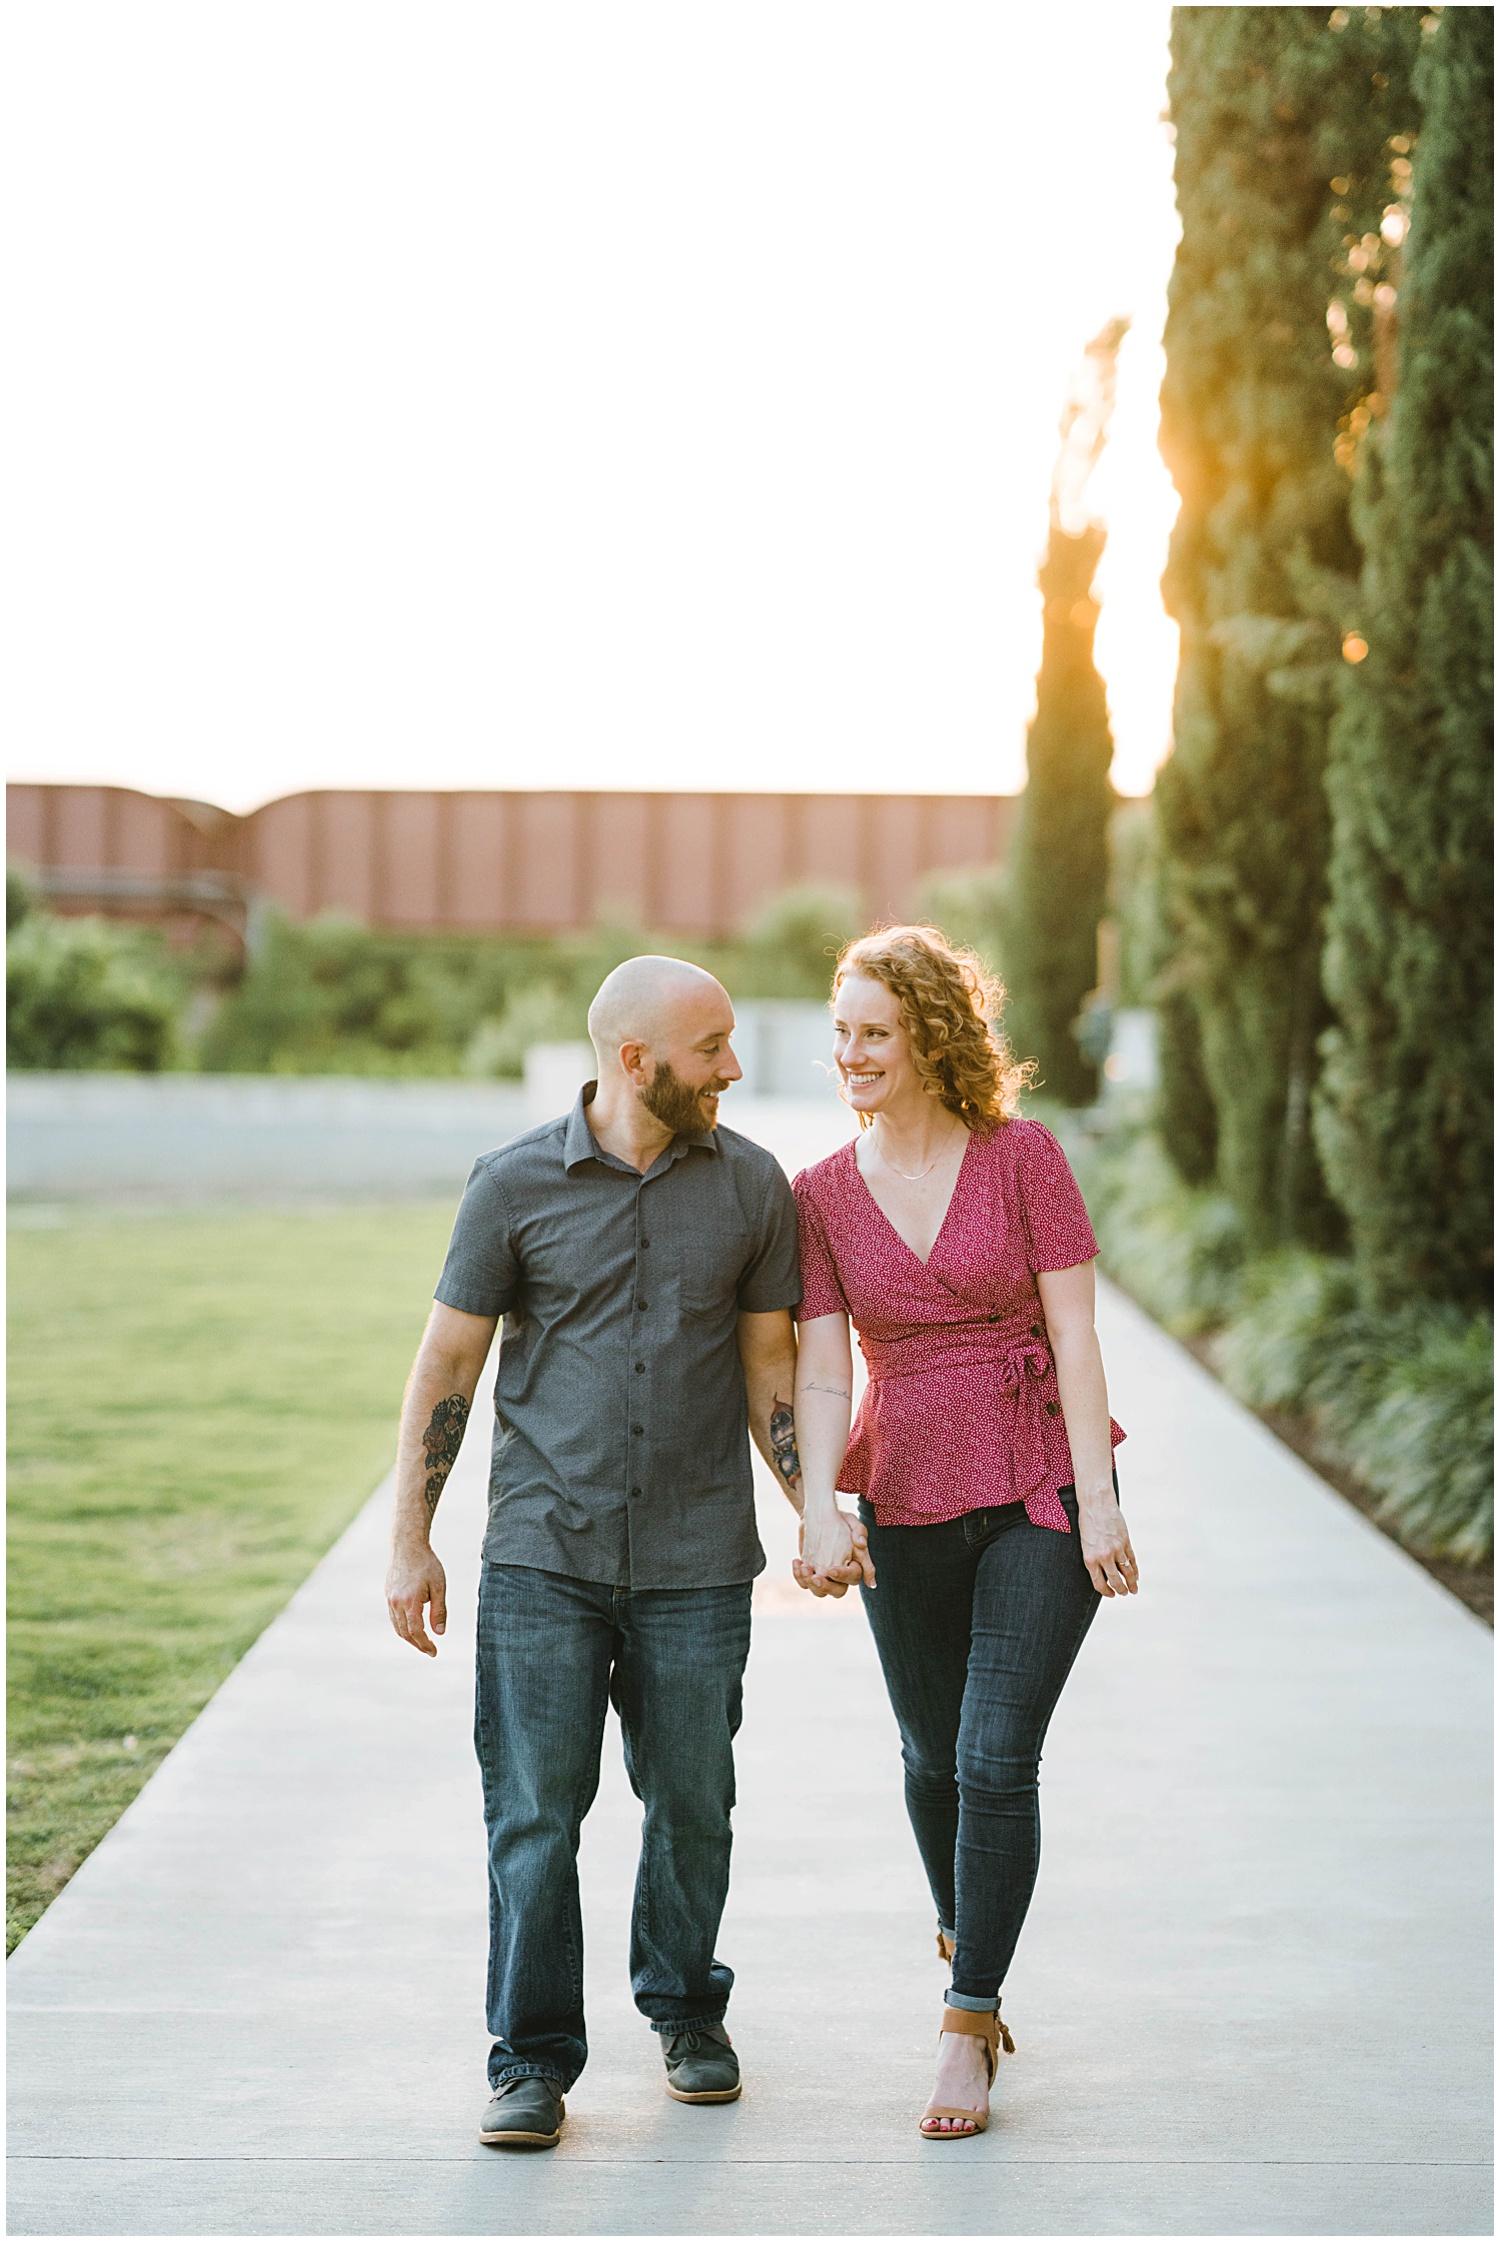 organic_austin_couples_photo_session_downtown_0132.jpg